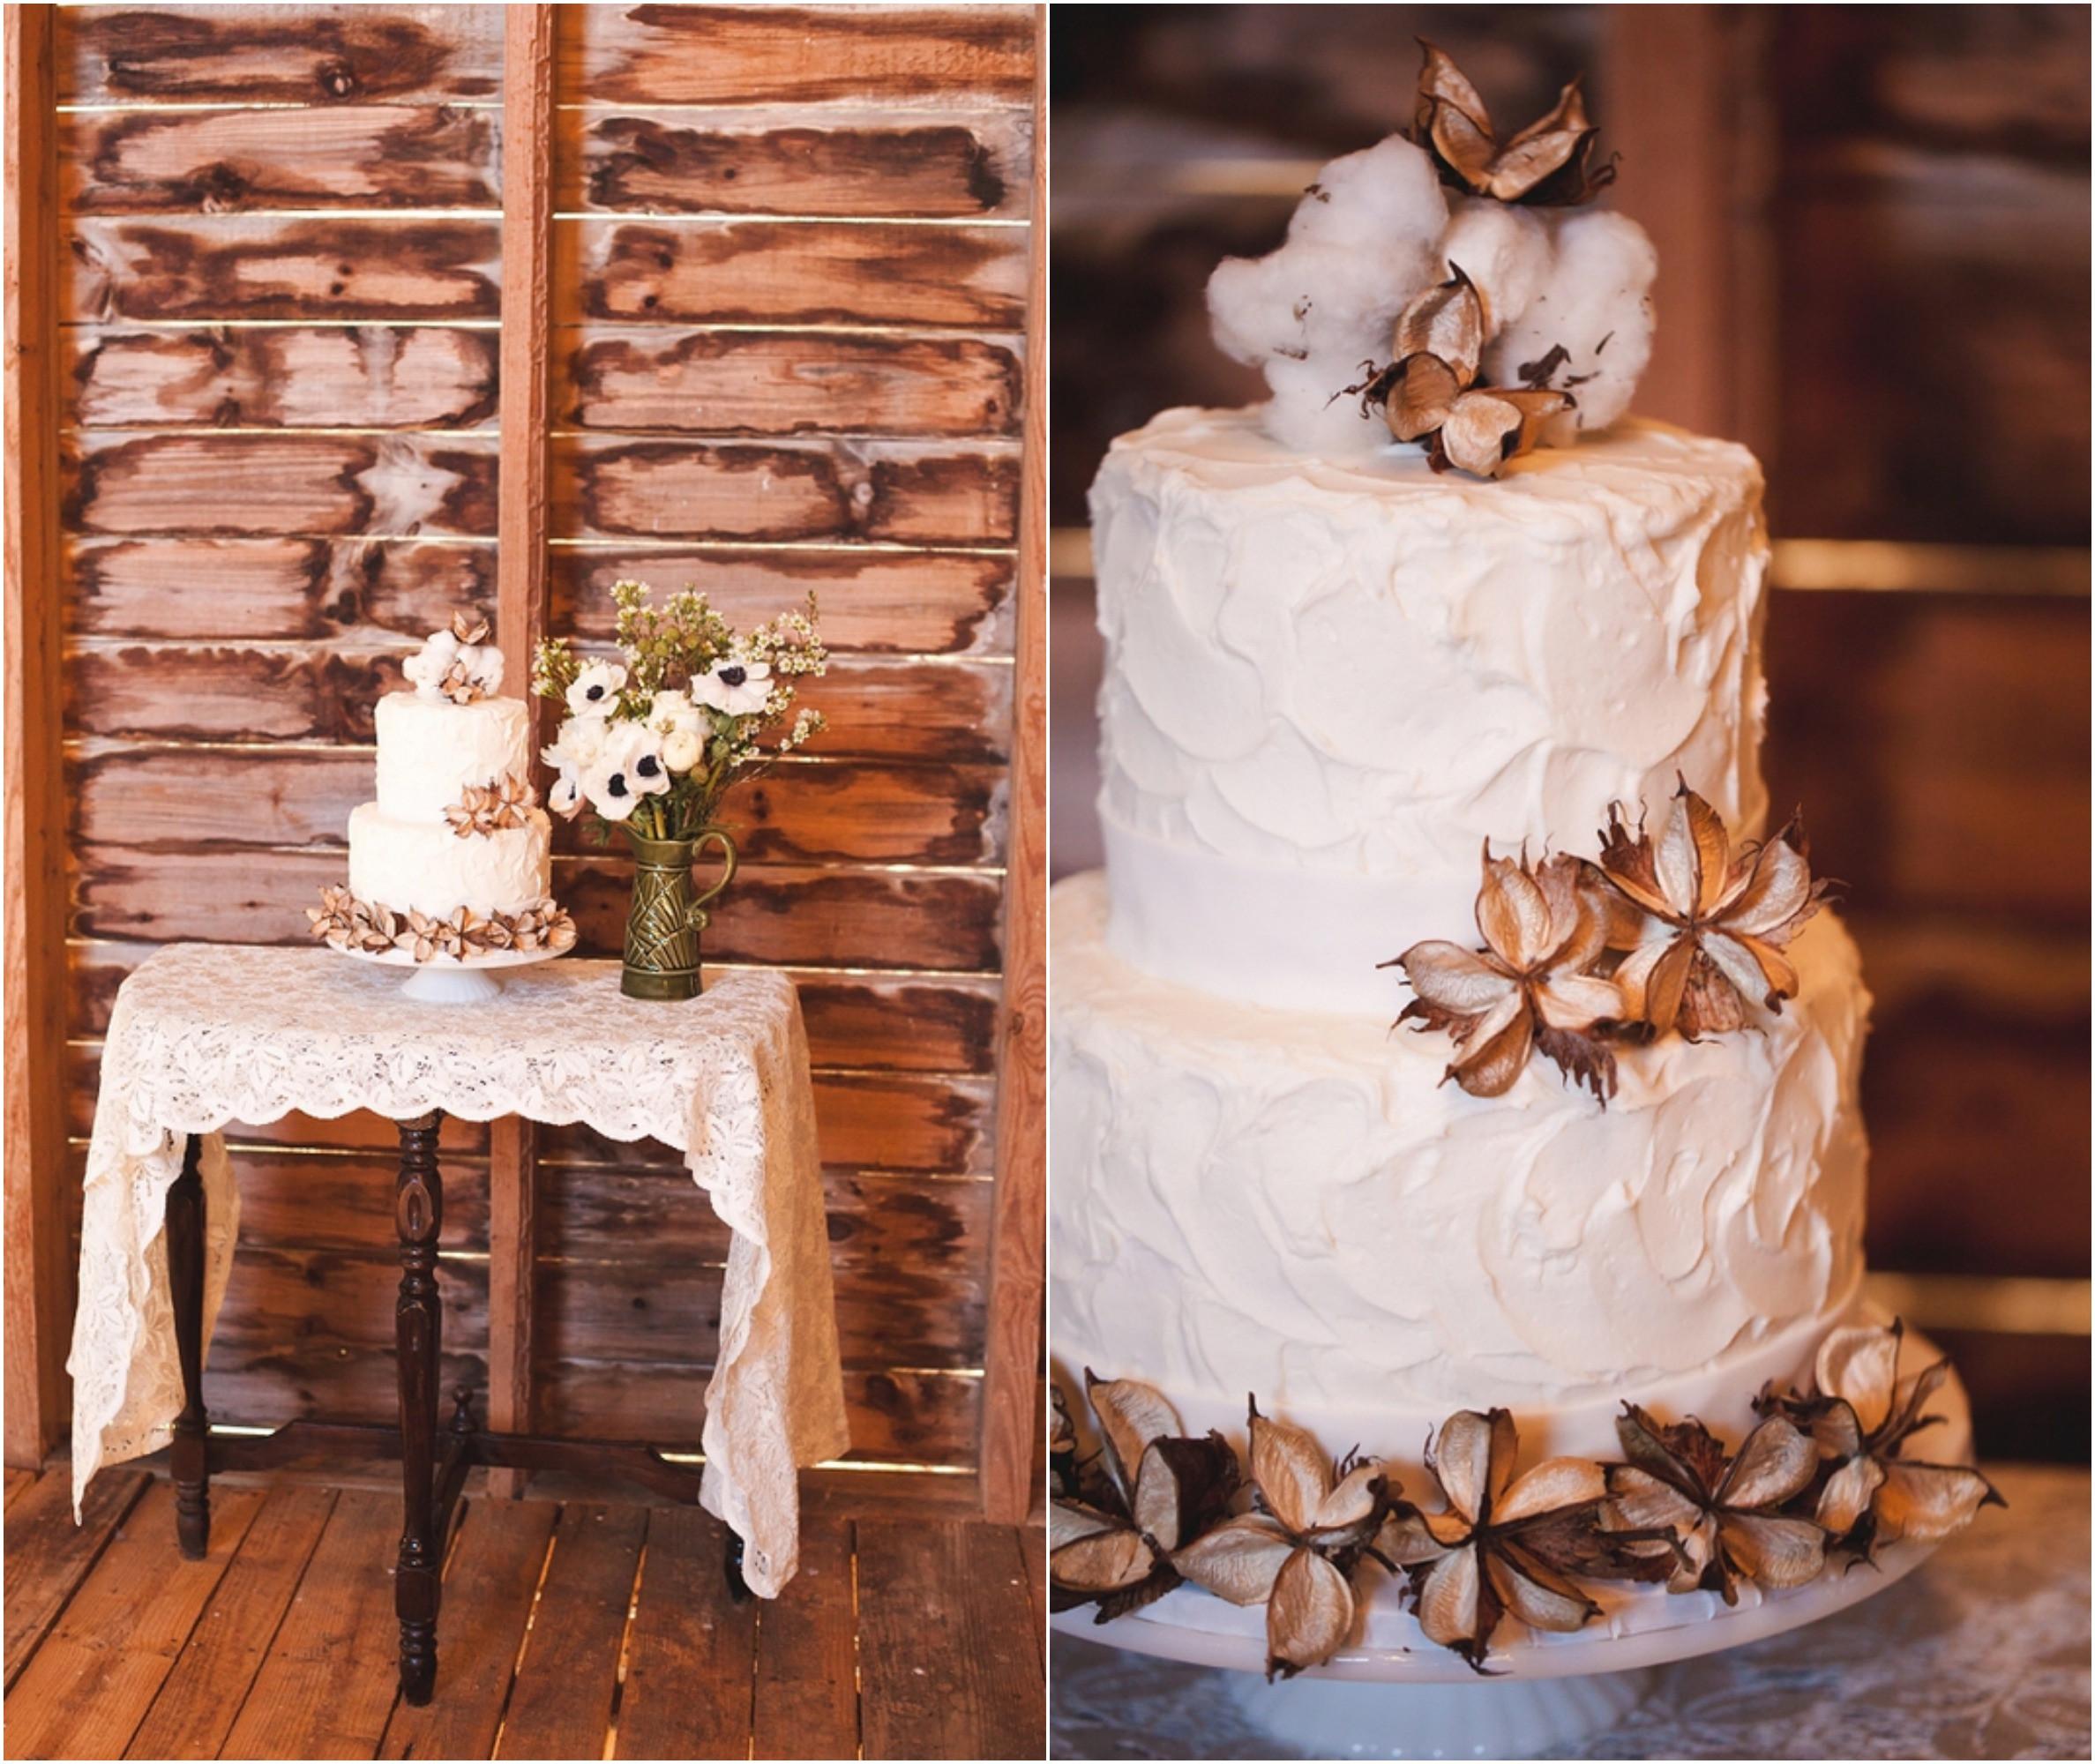 Rustic Wedding Cakes  Romantic Rustic Wedding Inspiration Rustic Wedding Chic